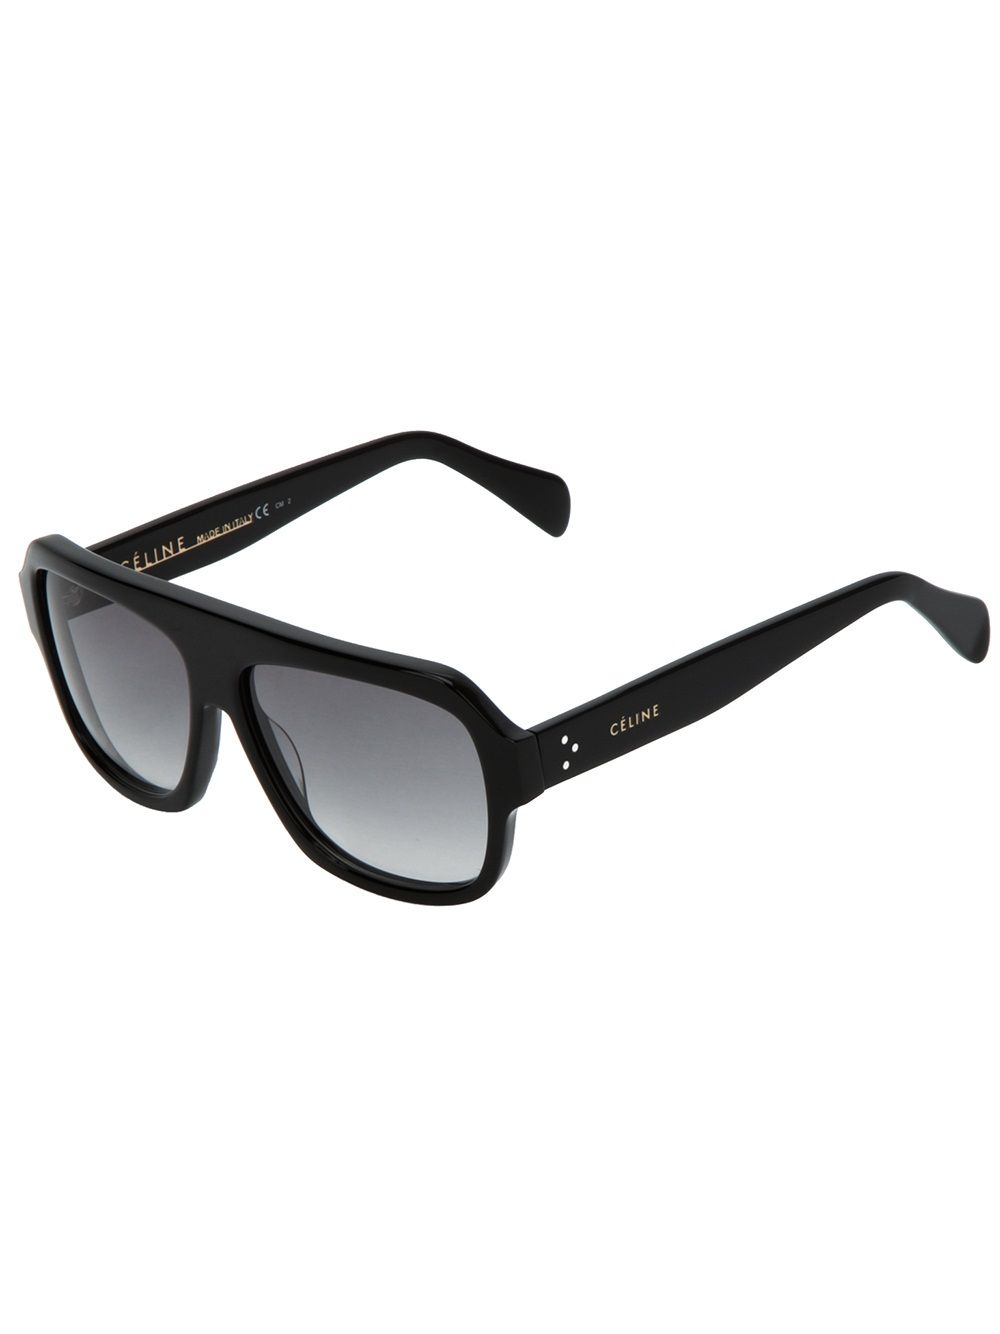 623453359c Céline Sunglasses - Mode De Vue - Farfetch.com | THE SUN IS TOO ...